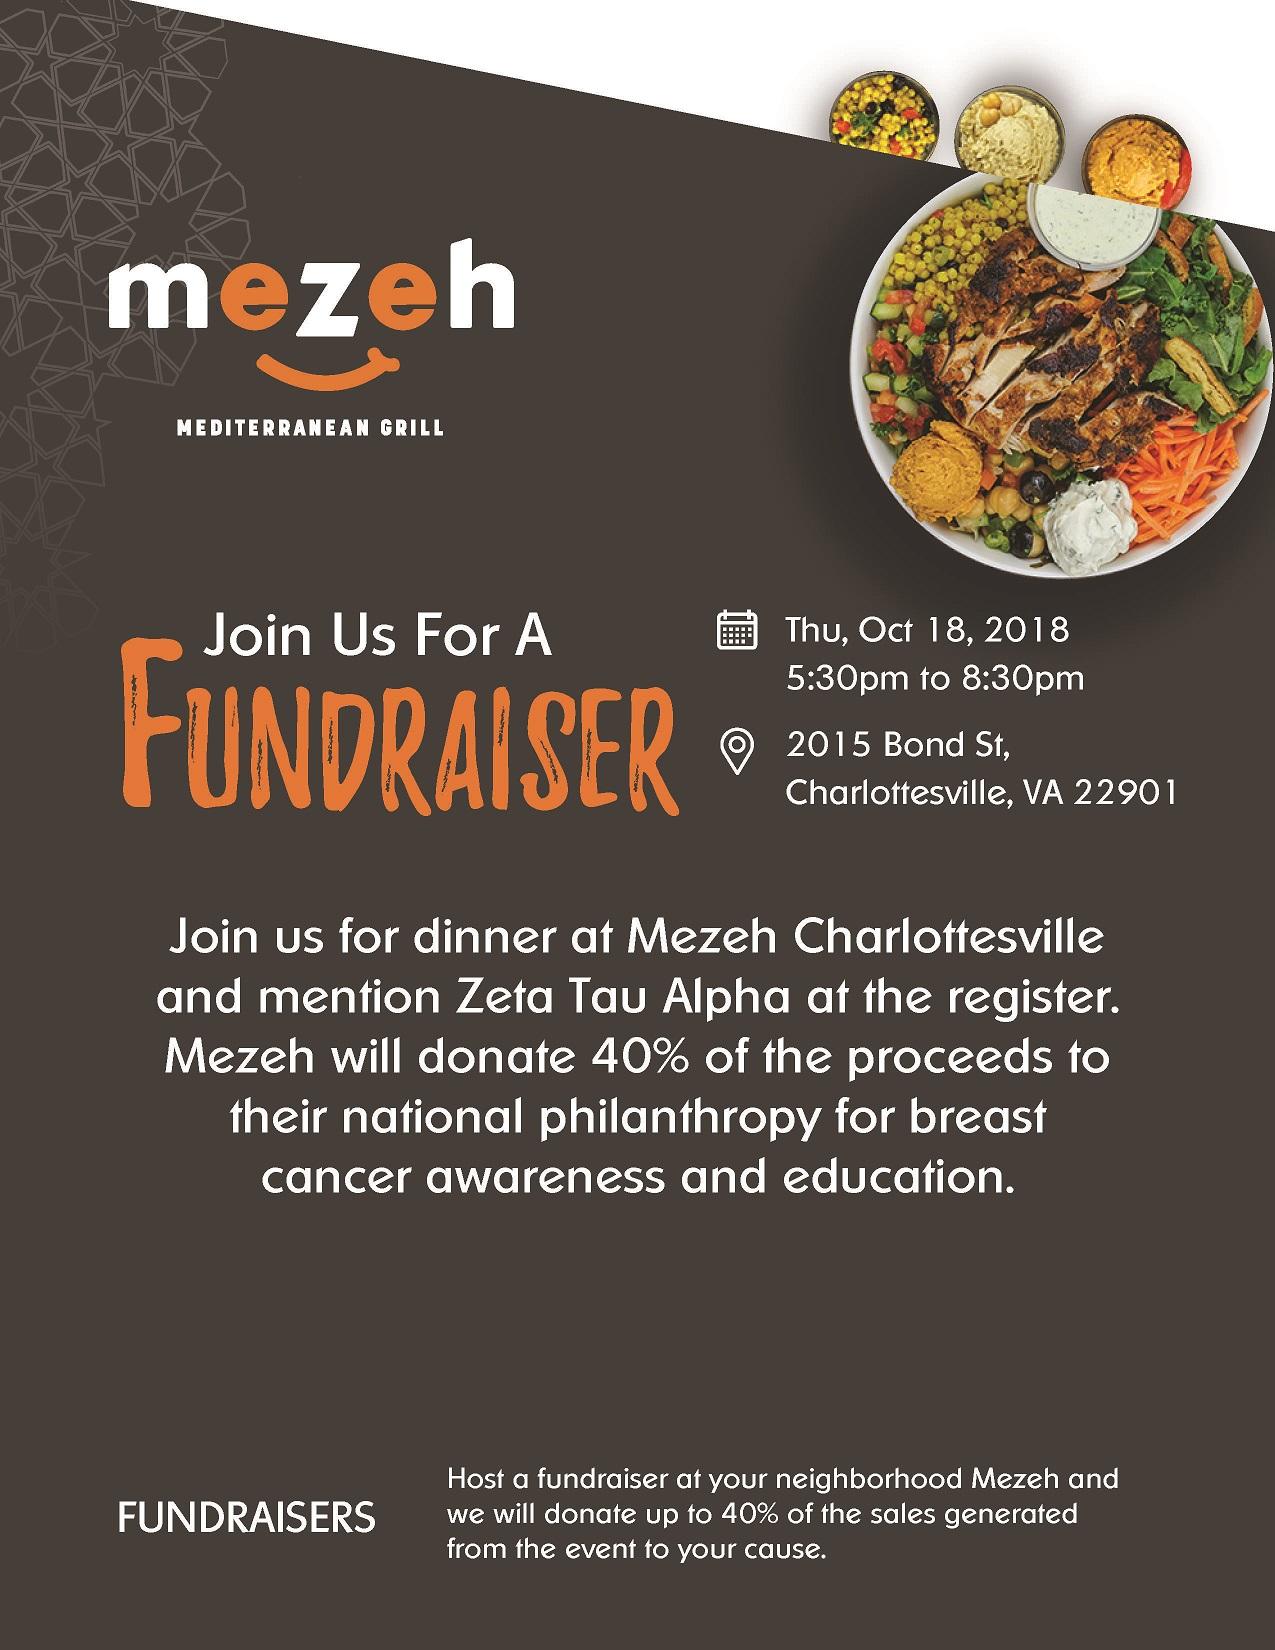 Zeta Tau Alpha Fundraiser at Mezeh Charlottesville